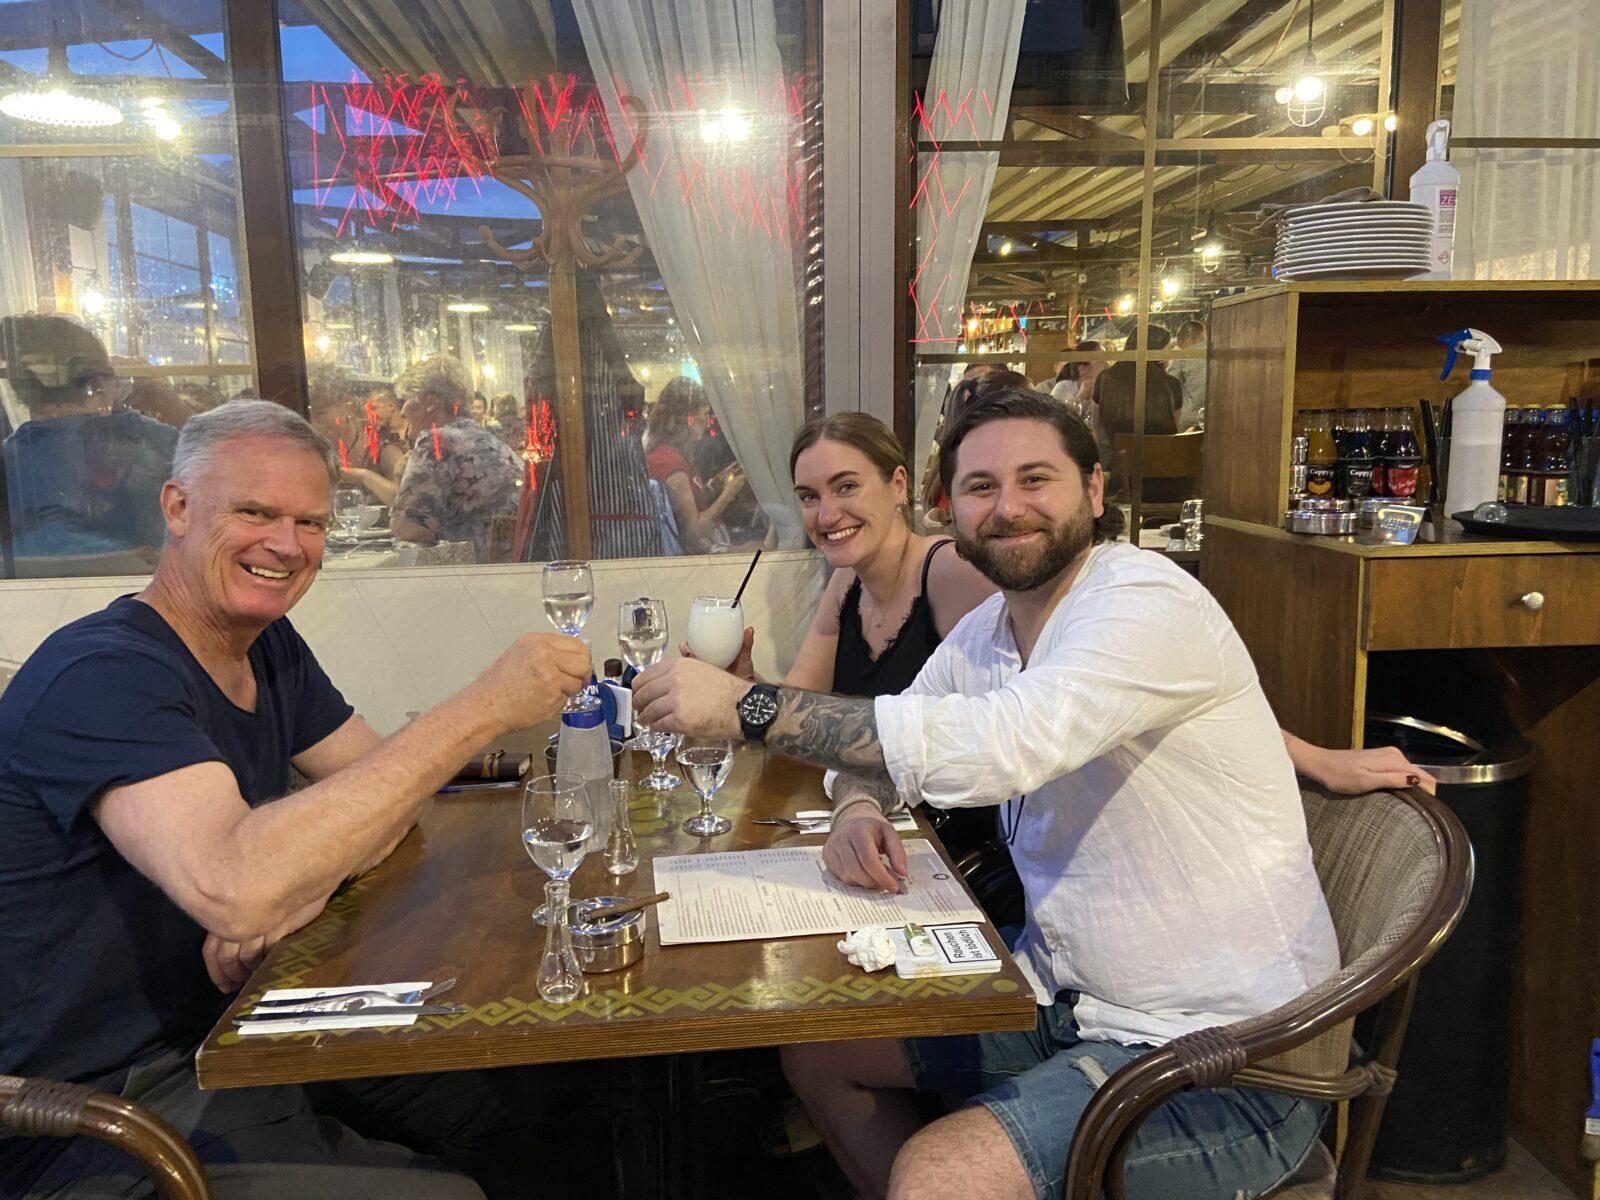 Toasting with rakia with Valentin and Sonja at Stariya Chinar in Varna.